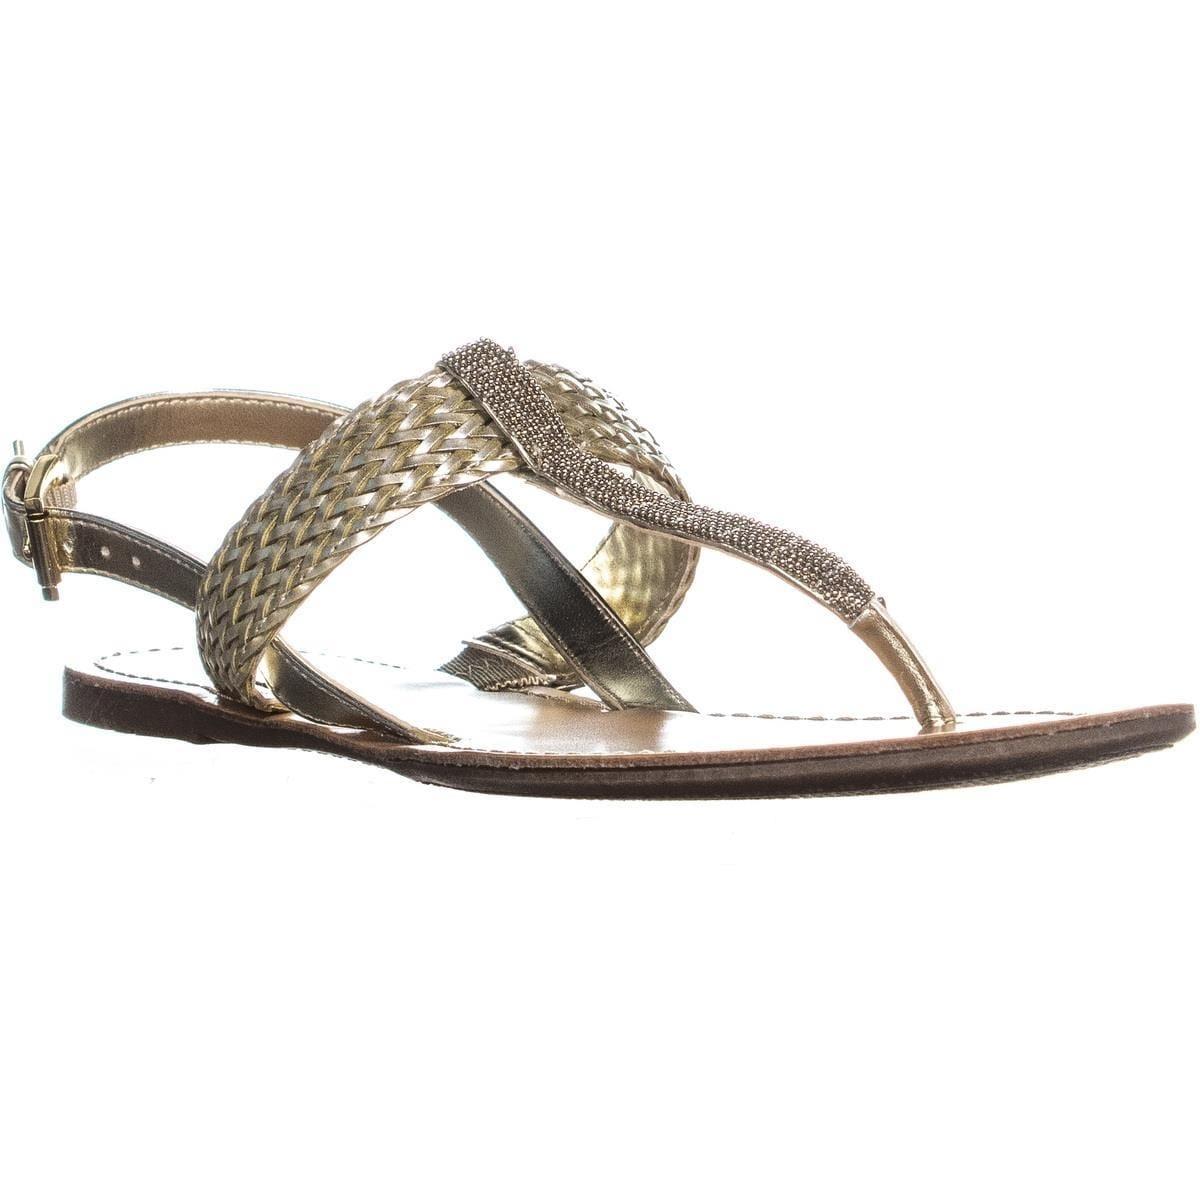 791ca2570 Shop Tommy Hilfiger Lorida Ankle Strap Sandals